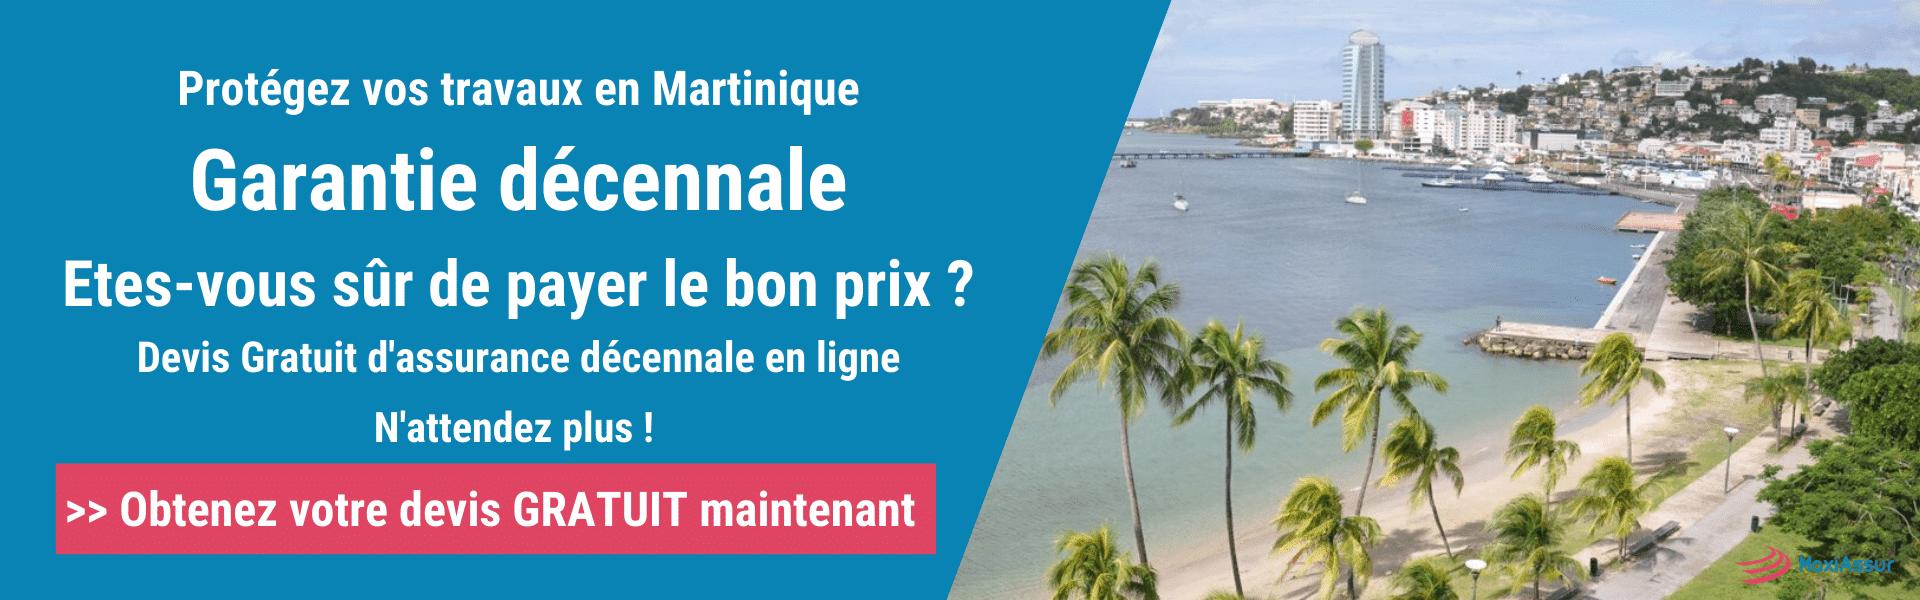 Garantie décennale Martinique